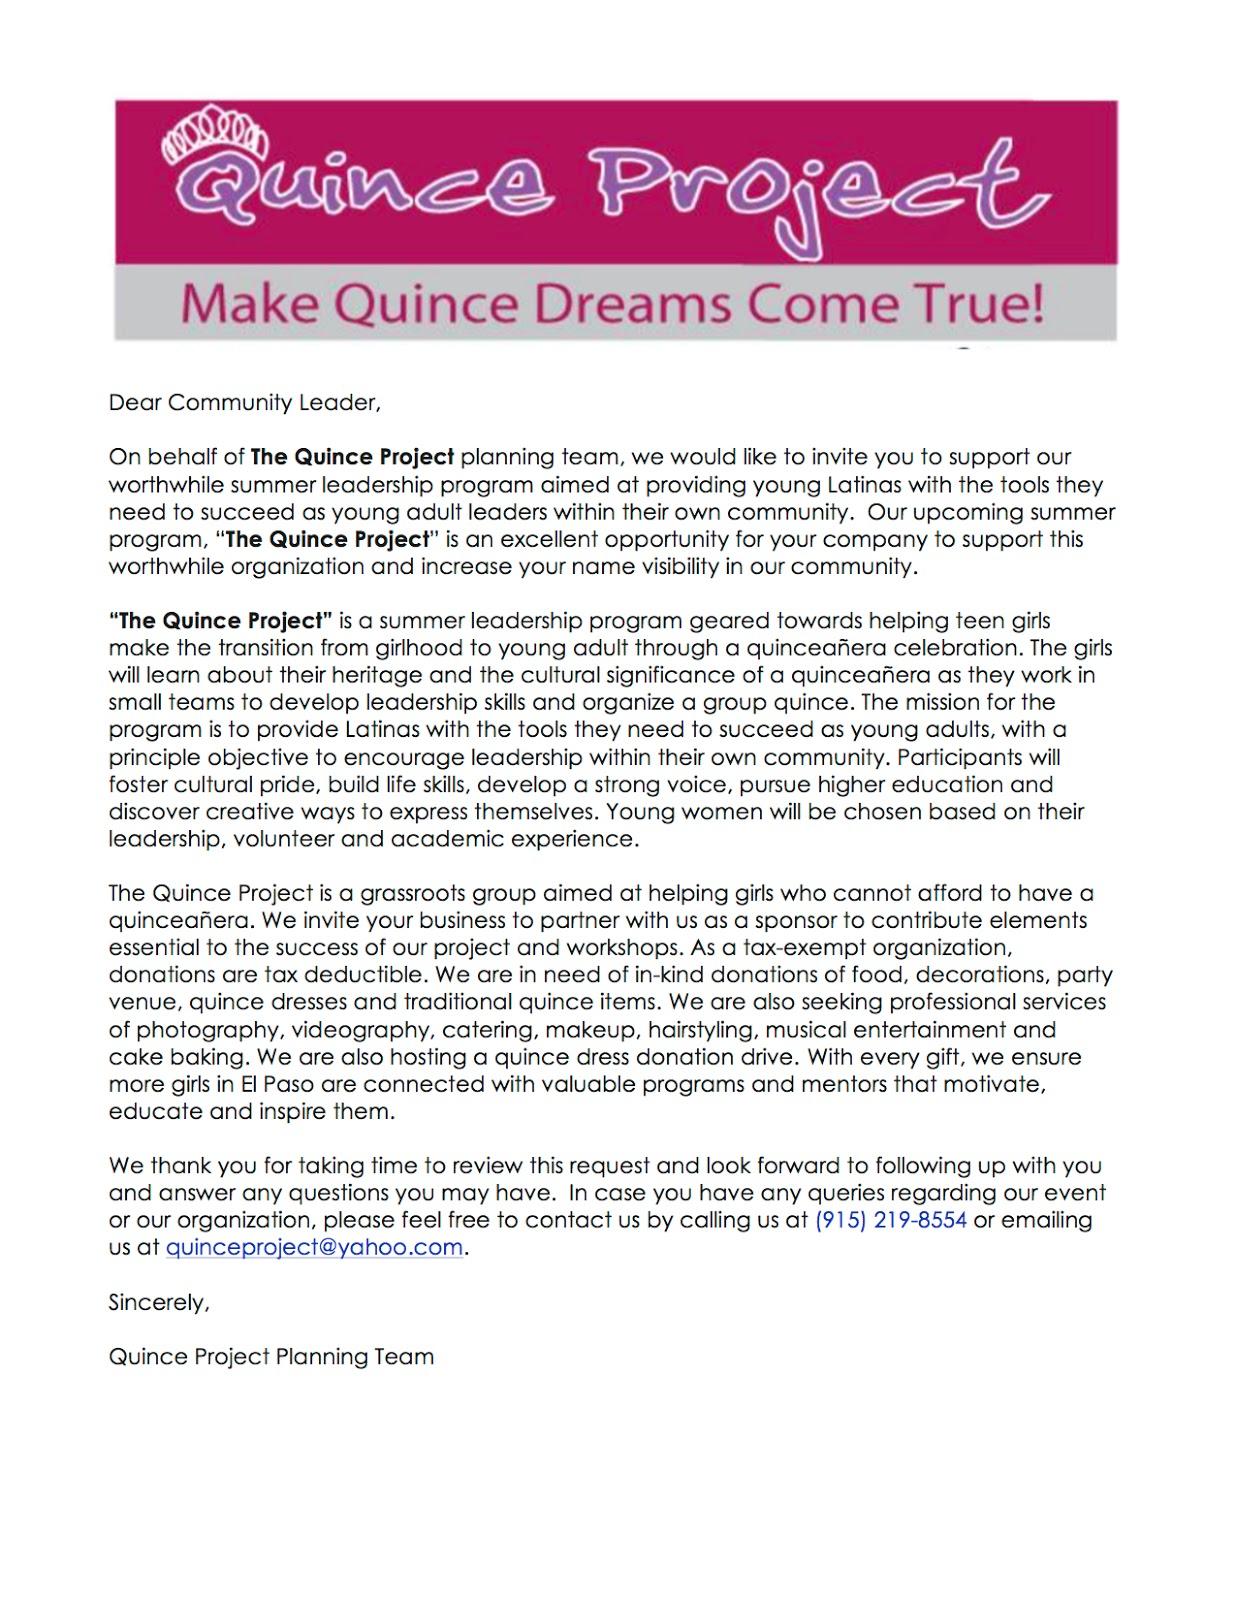 100 Charity Resignation Letter Say Goodbye Letter